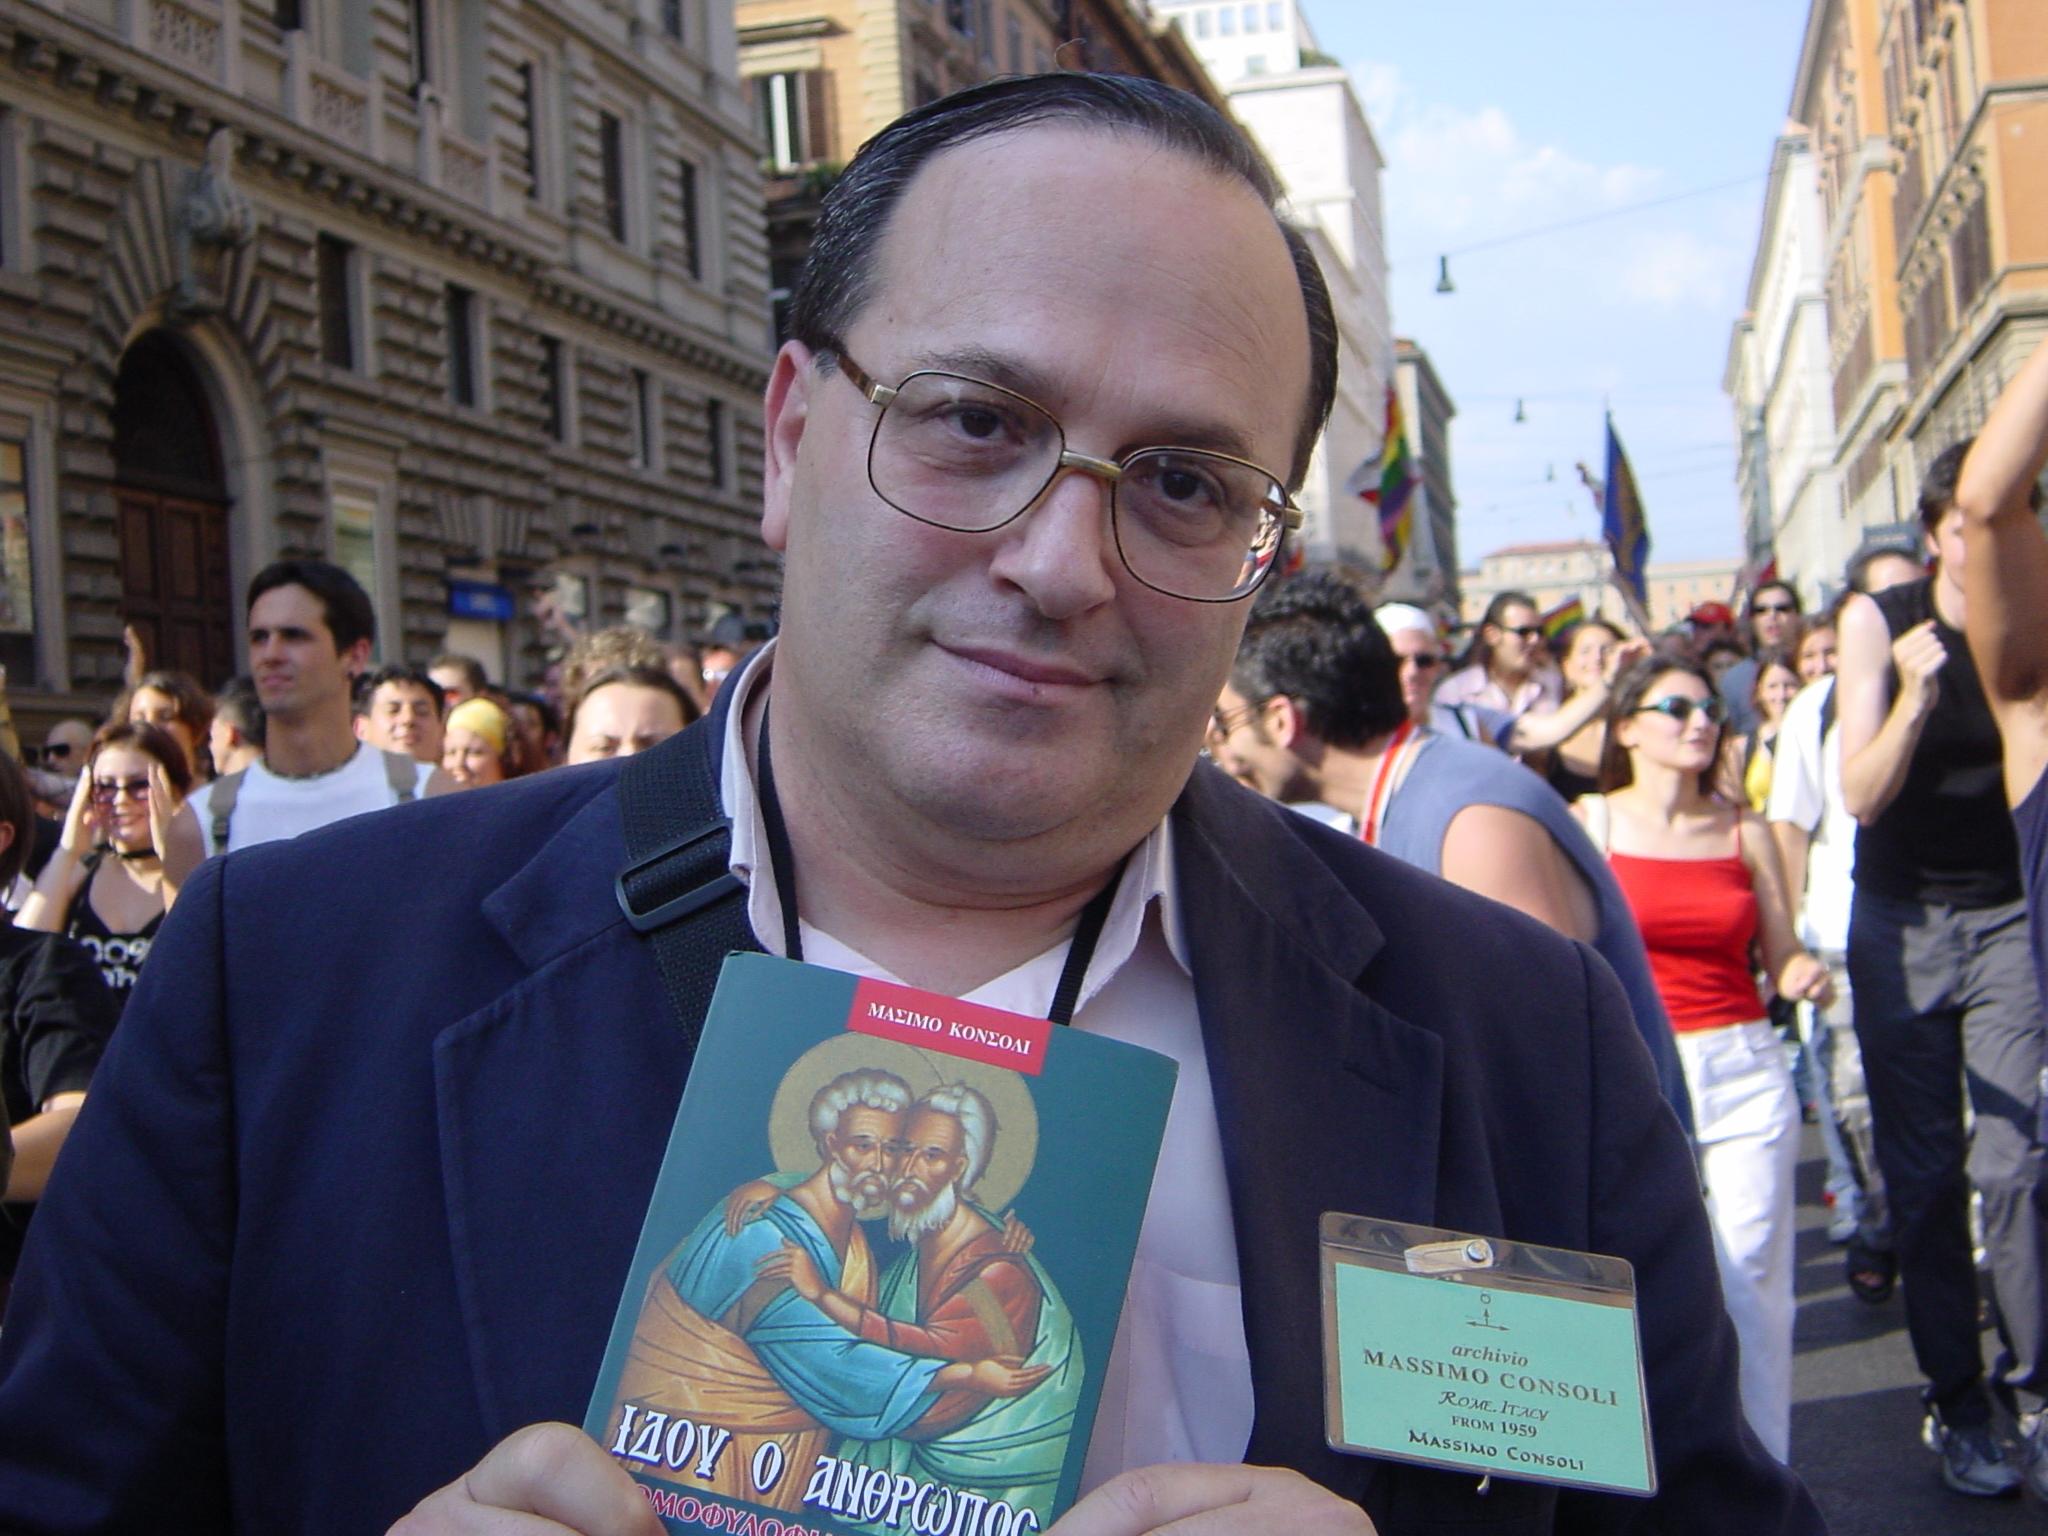 Massimo Consoli 2002.